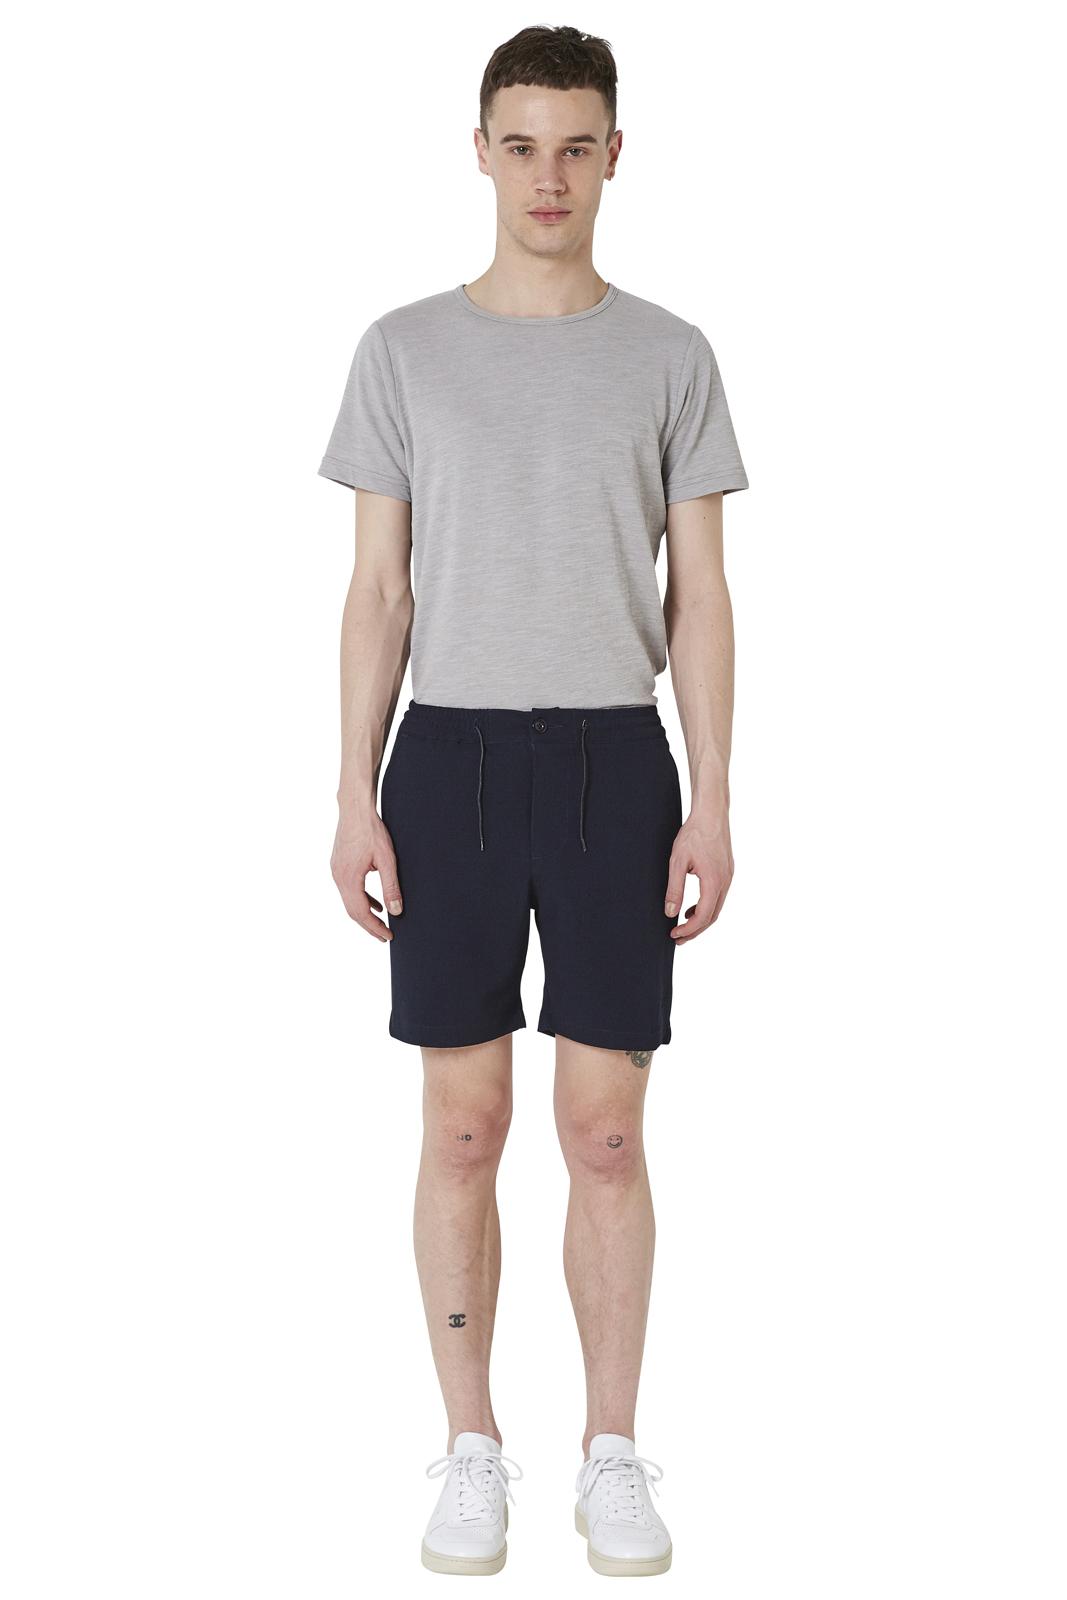 - Seersucker effect bermuda - Slim fit - Elastic waistband